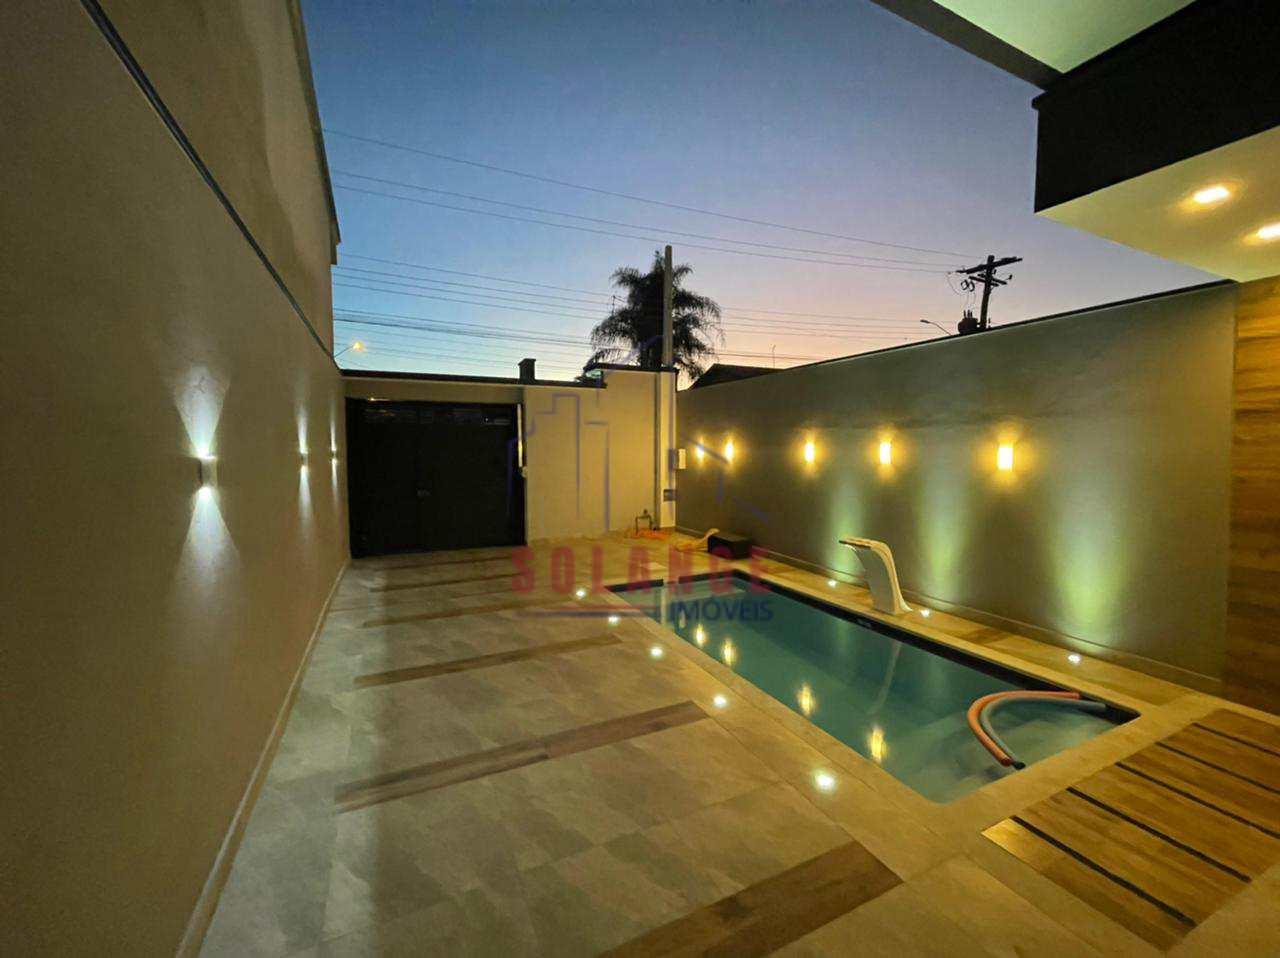 Casa com 2 dorms, Jardim Silvestre I, Amparo, Cod: 2340